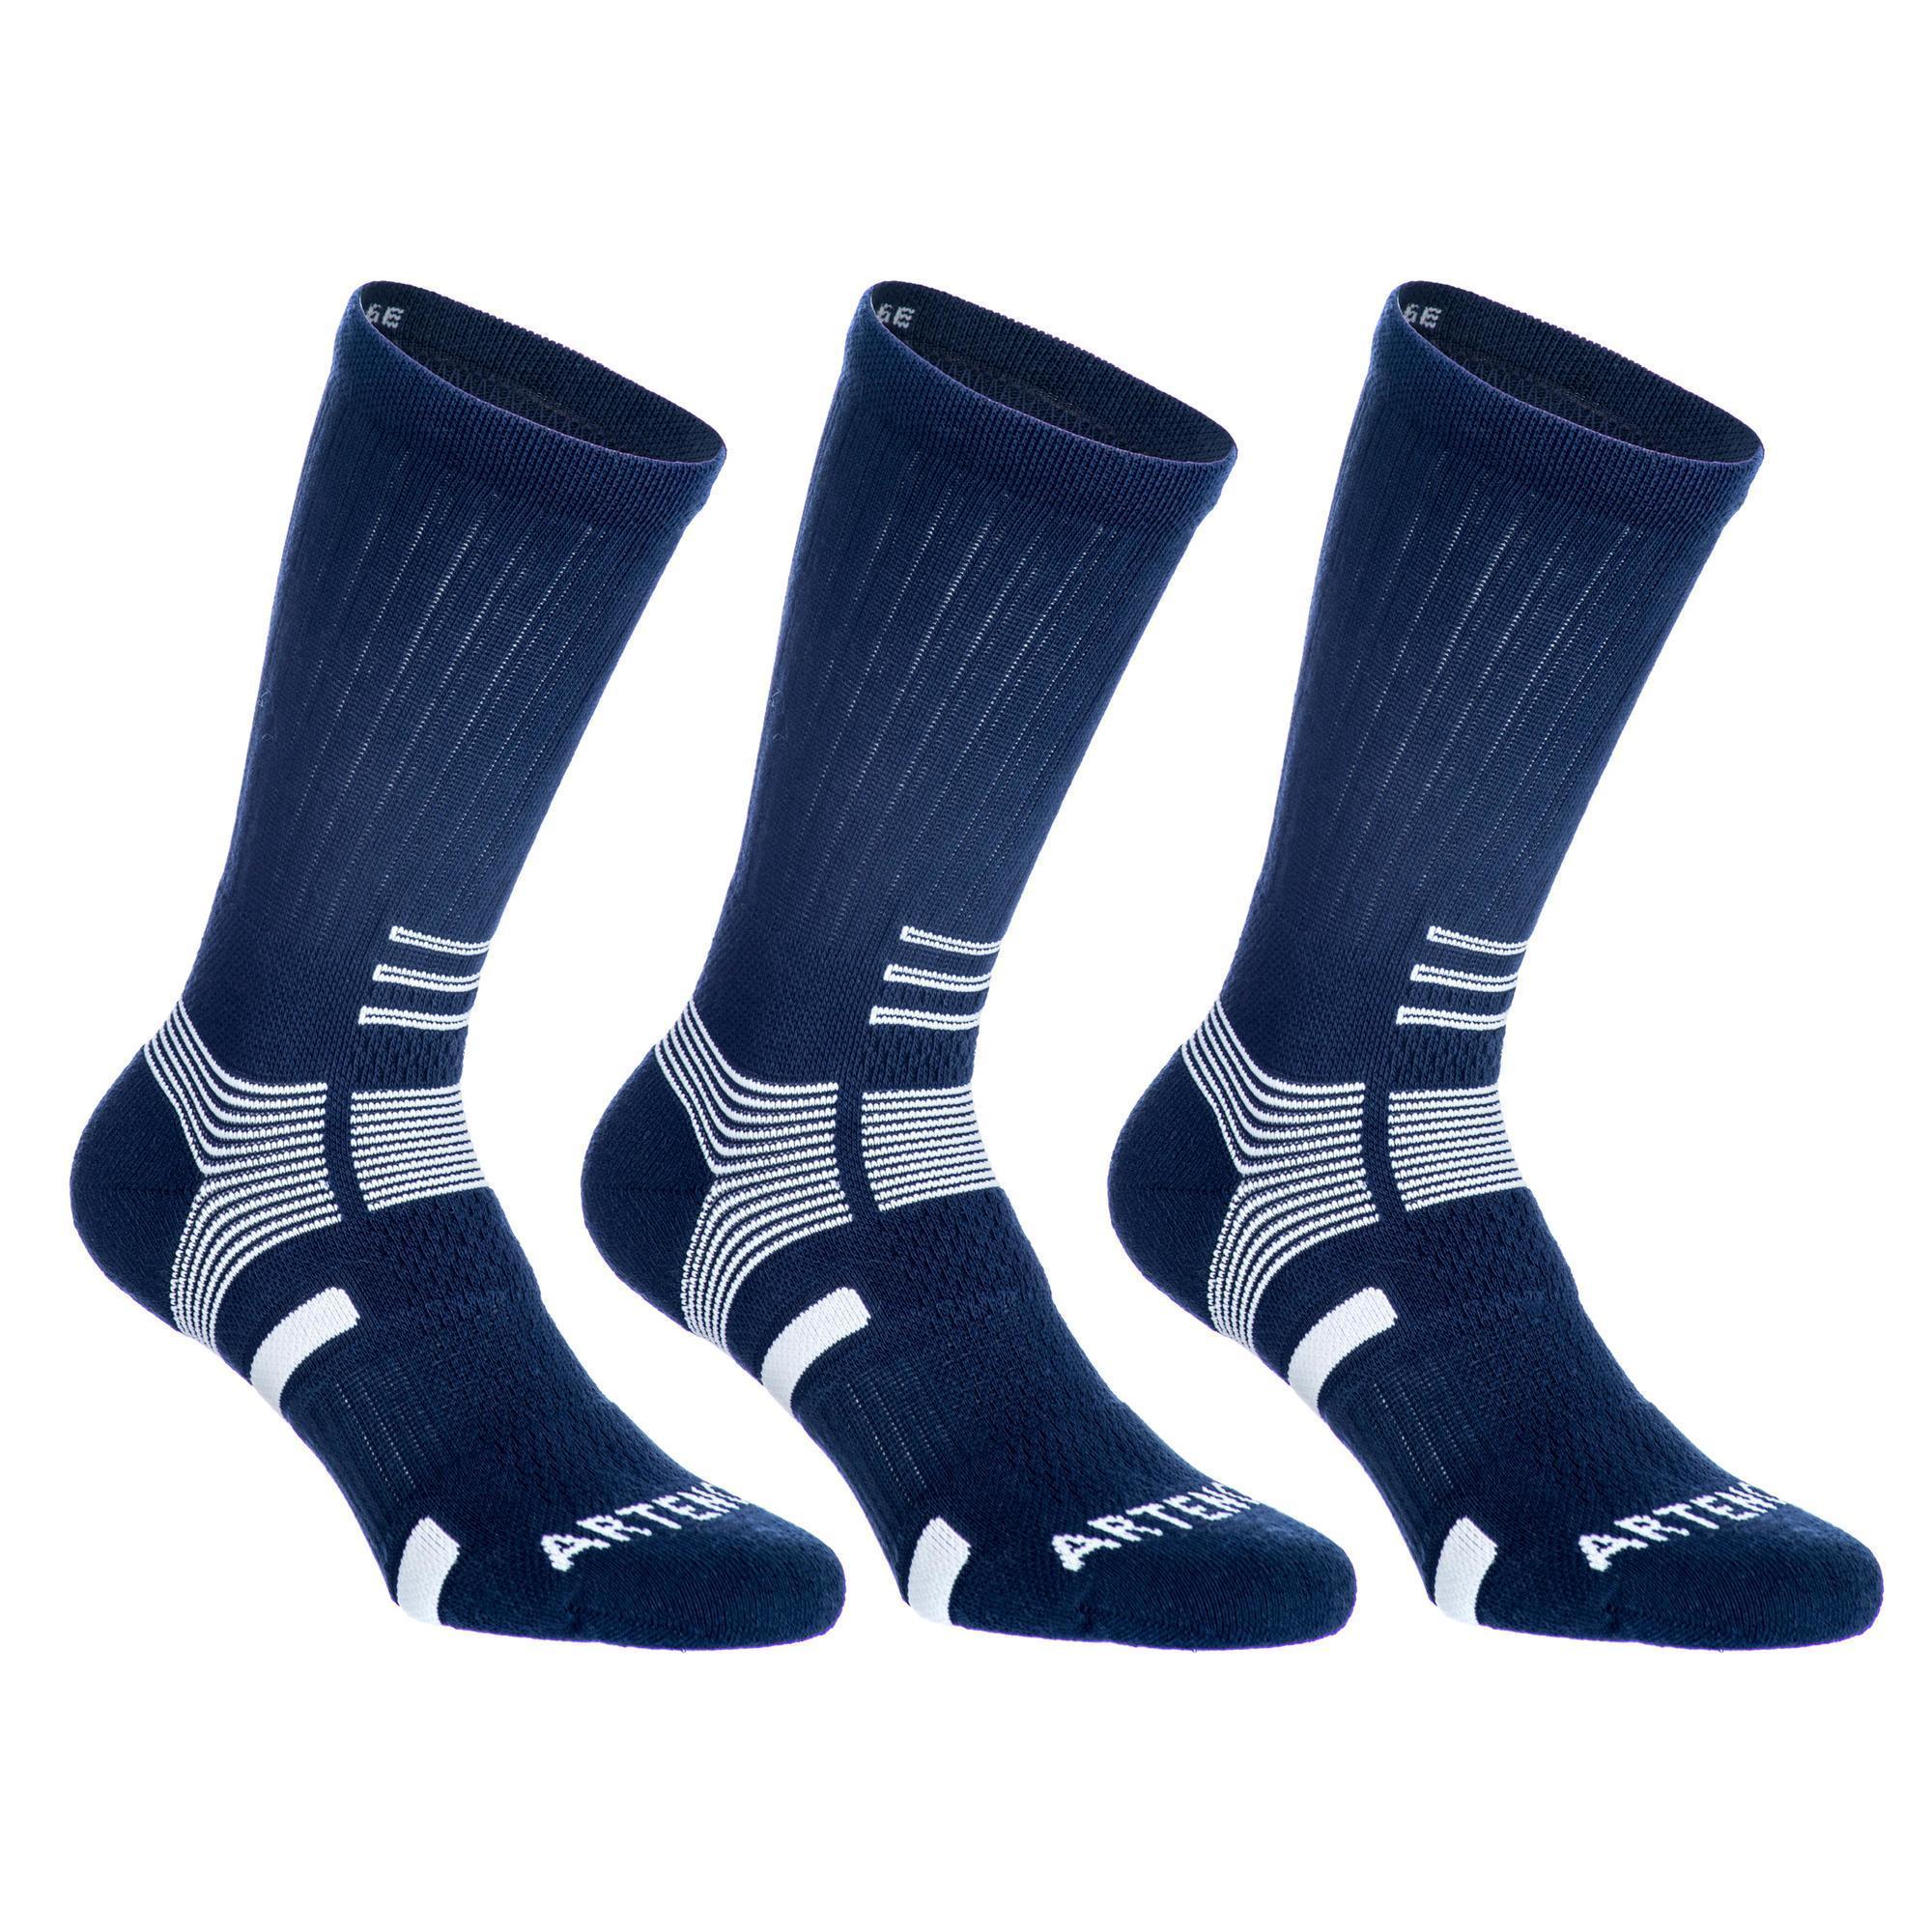 Tennissocken RS 560 High 3er-Pack blau/weiß Artengo | Sportbekleidung > Funktionswäsche > Sportsocken | Blau - Weiß | Pikee | Artengo